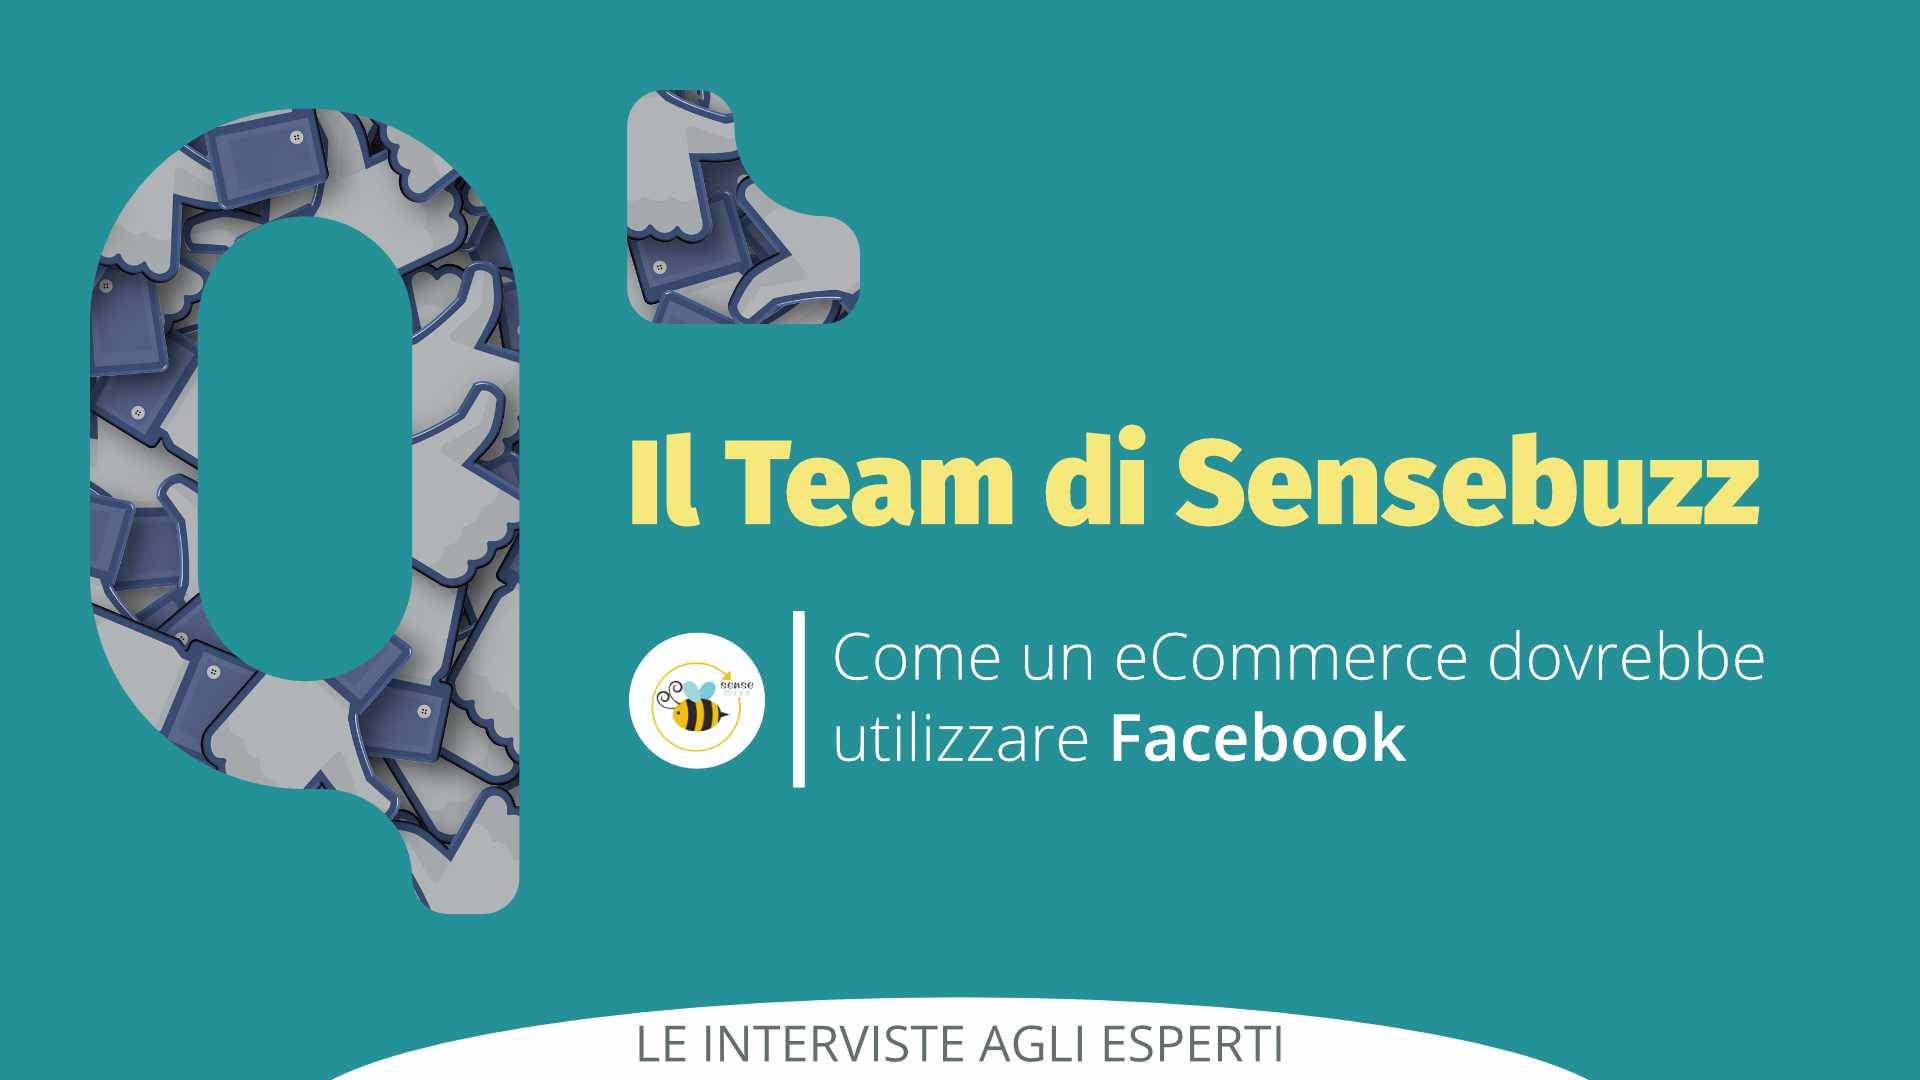 Facebook: come deve utilizzarlo un eCommerce? – II Intervista a SenseBuzz